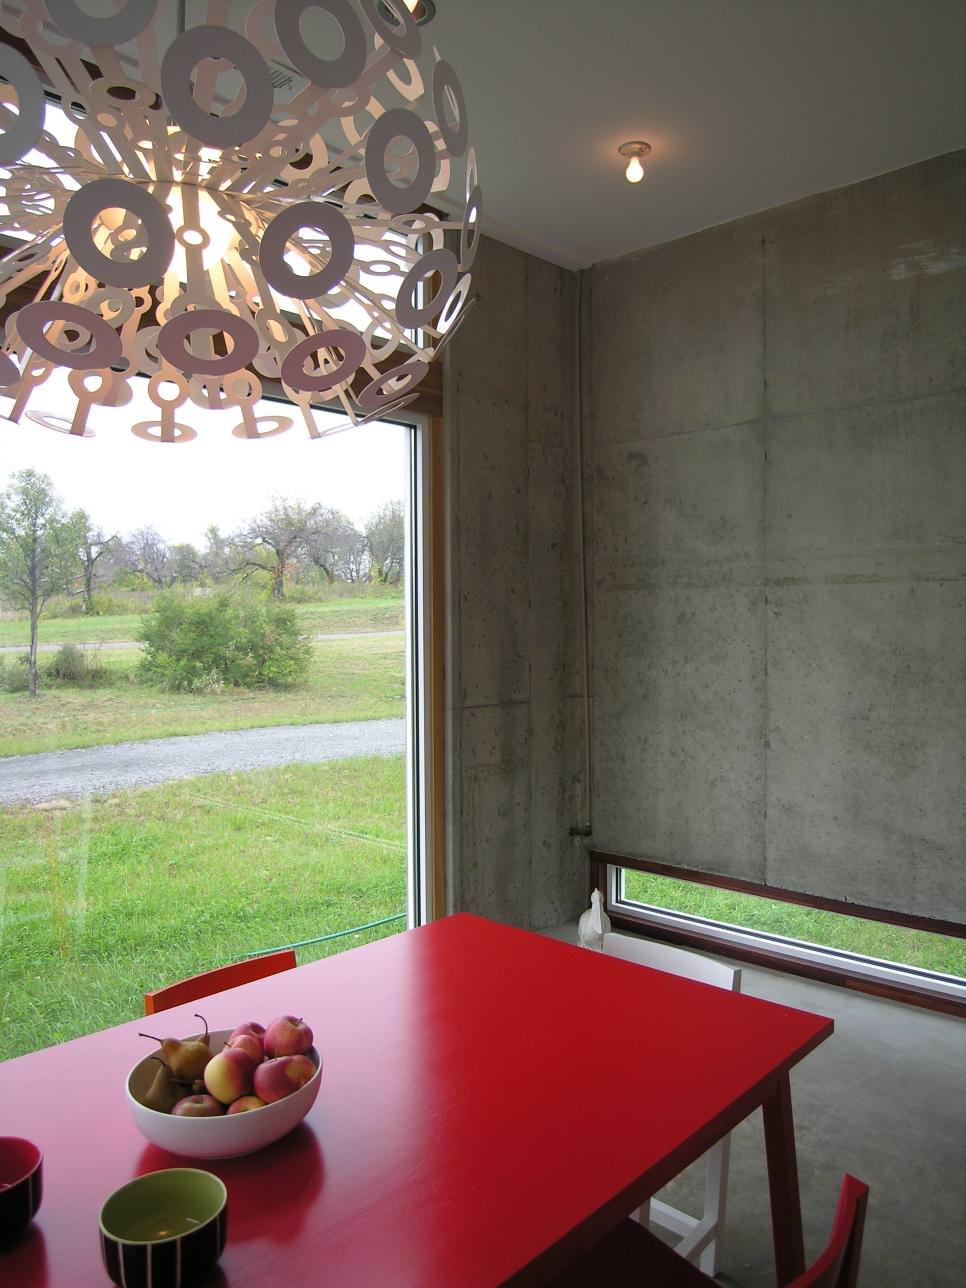 23 Concrete Wall Designs, Decor Ideas Design Trends - Patio Ideas